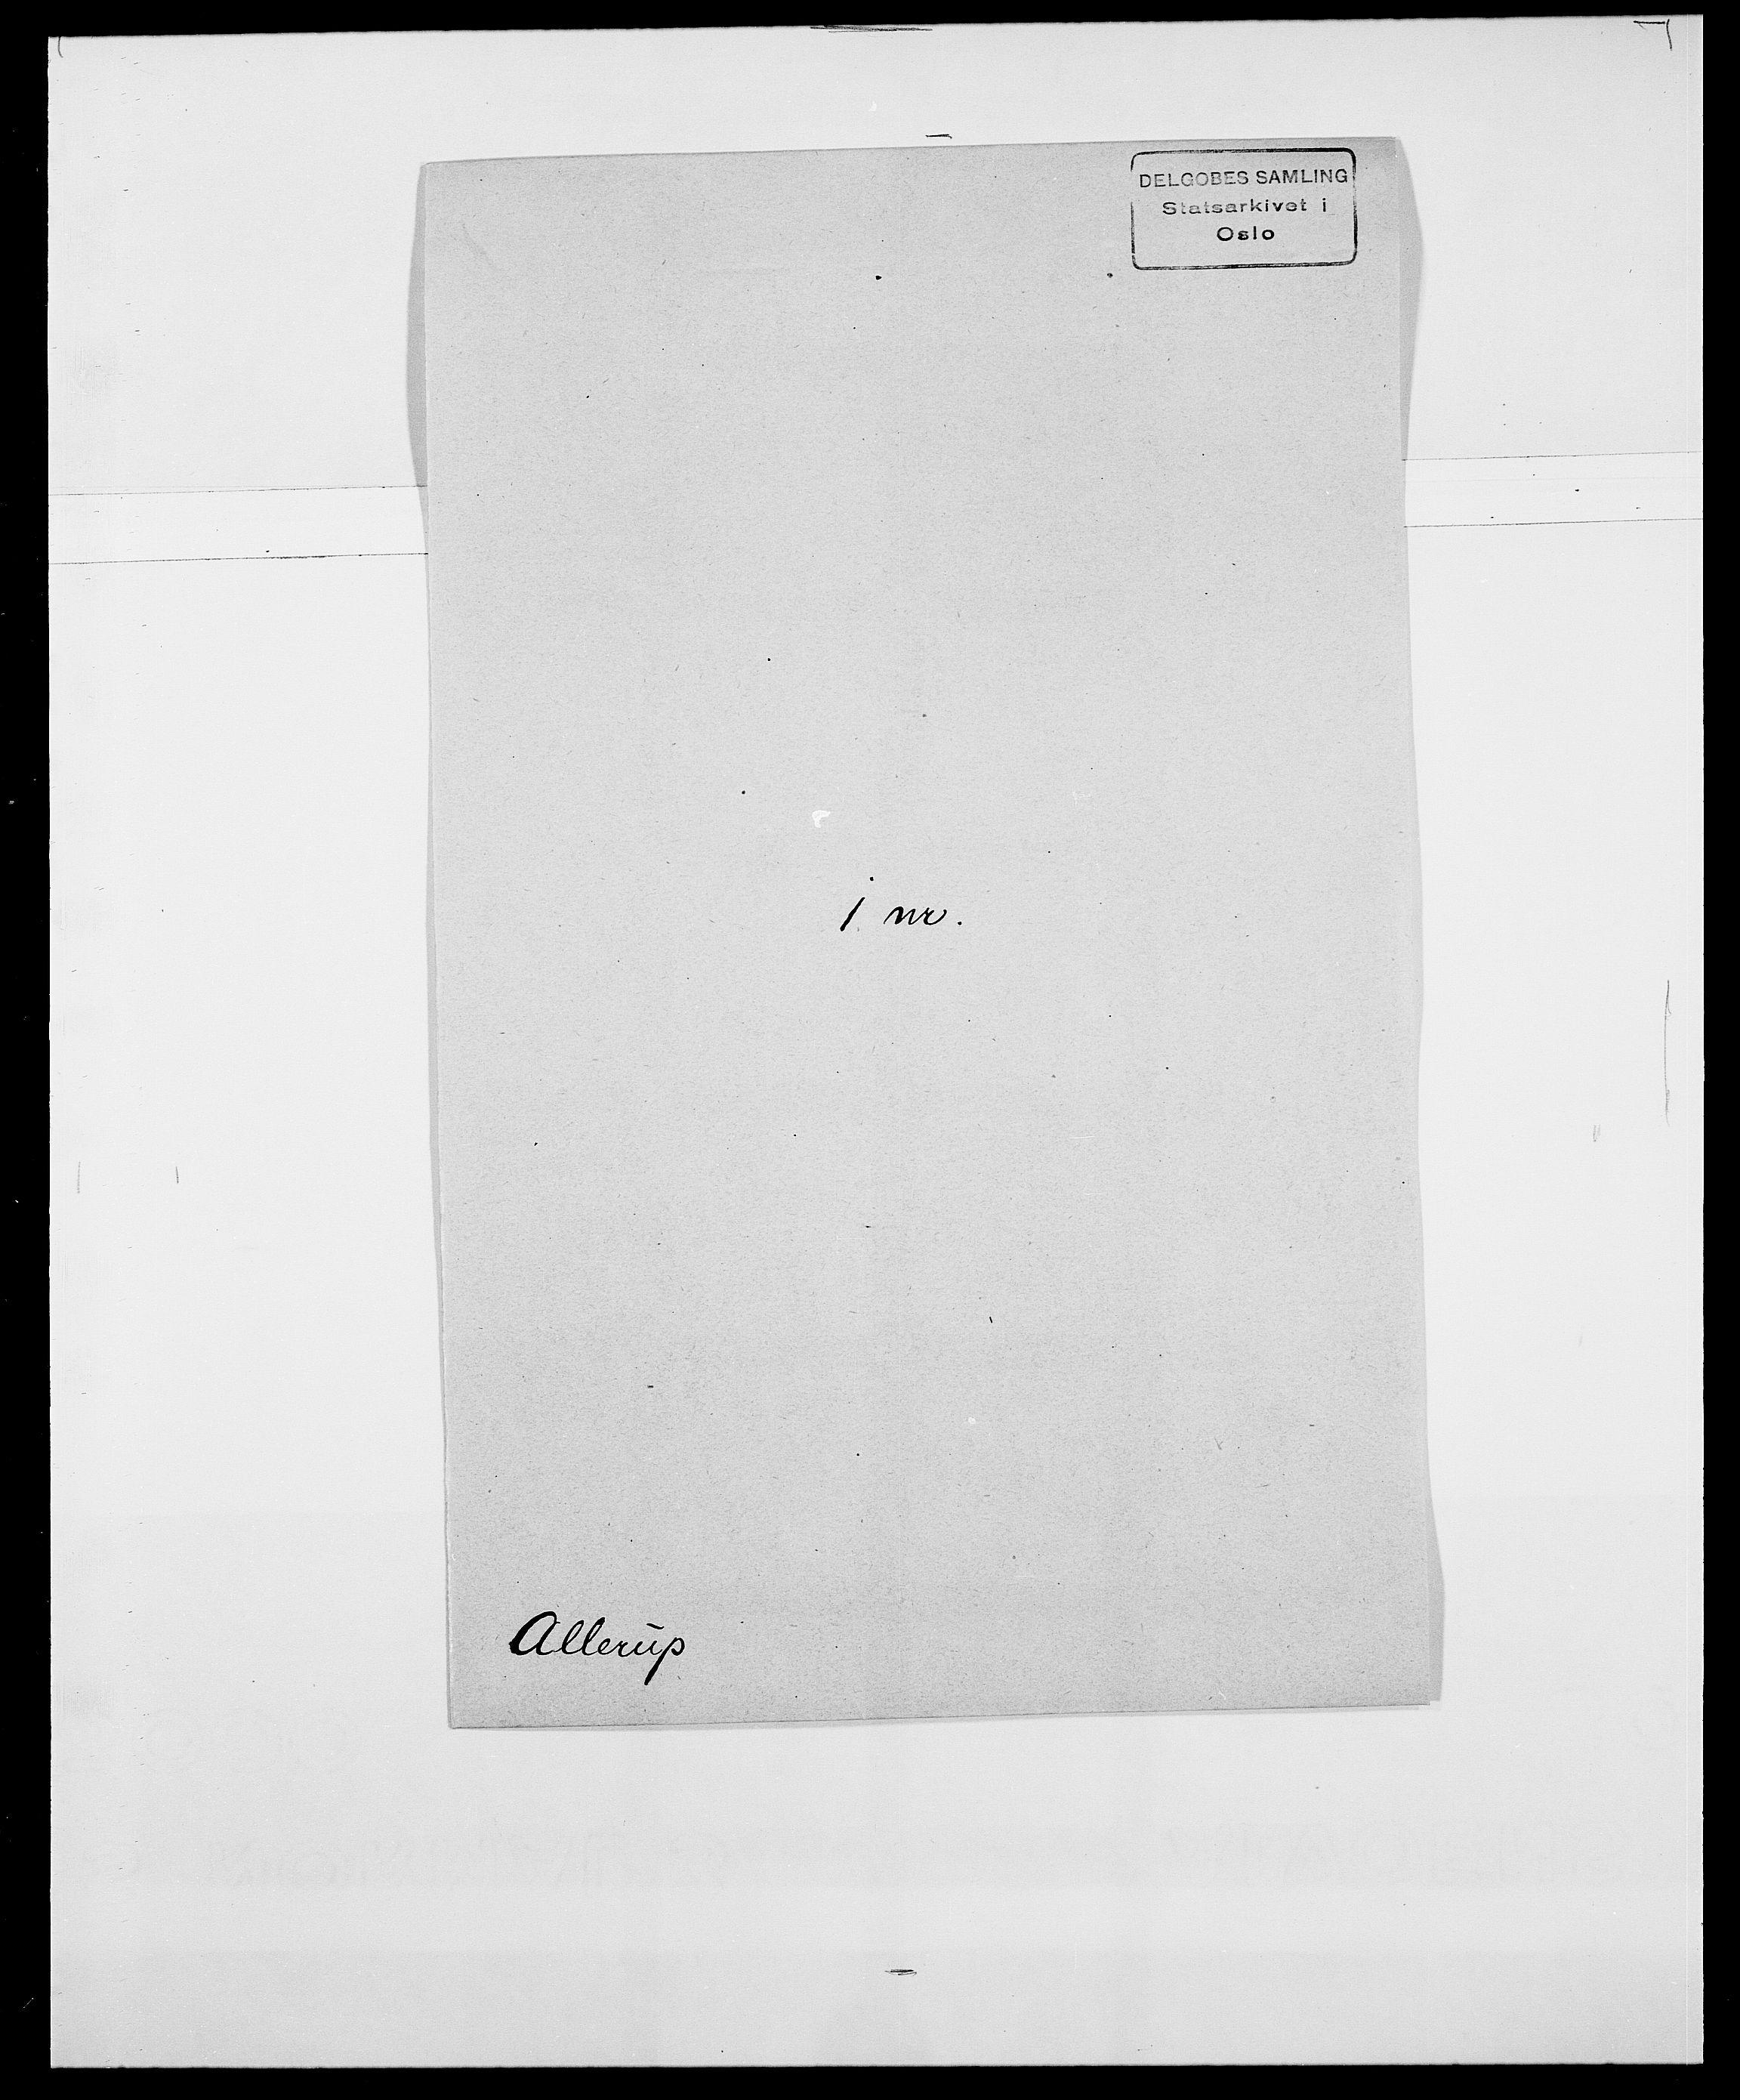 SAO, Delgobe, Charles Antoine - samling, D/Da/L0001: Aabye - Angerman, s. 422